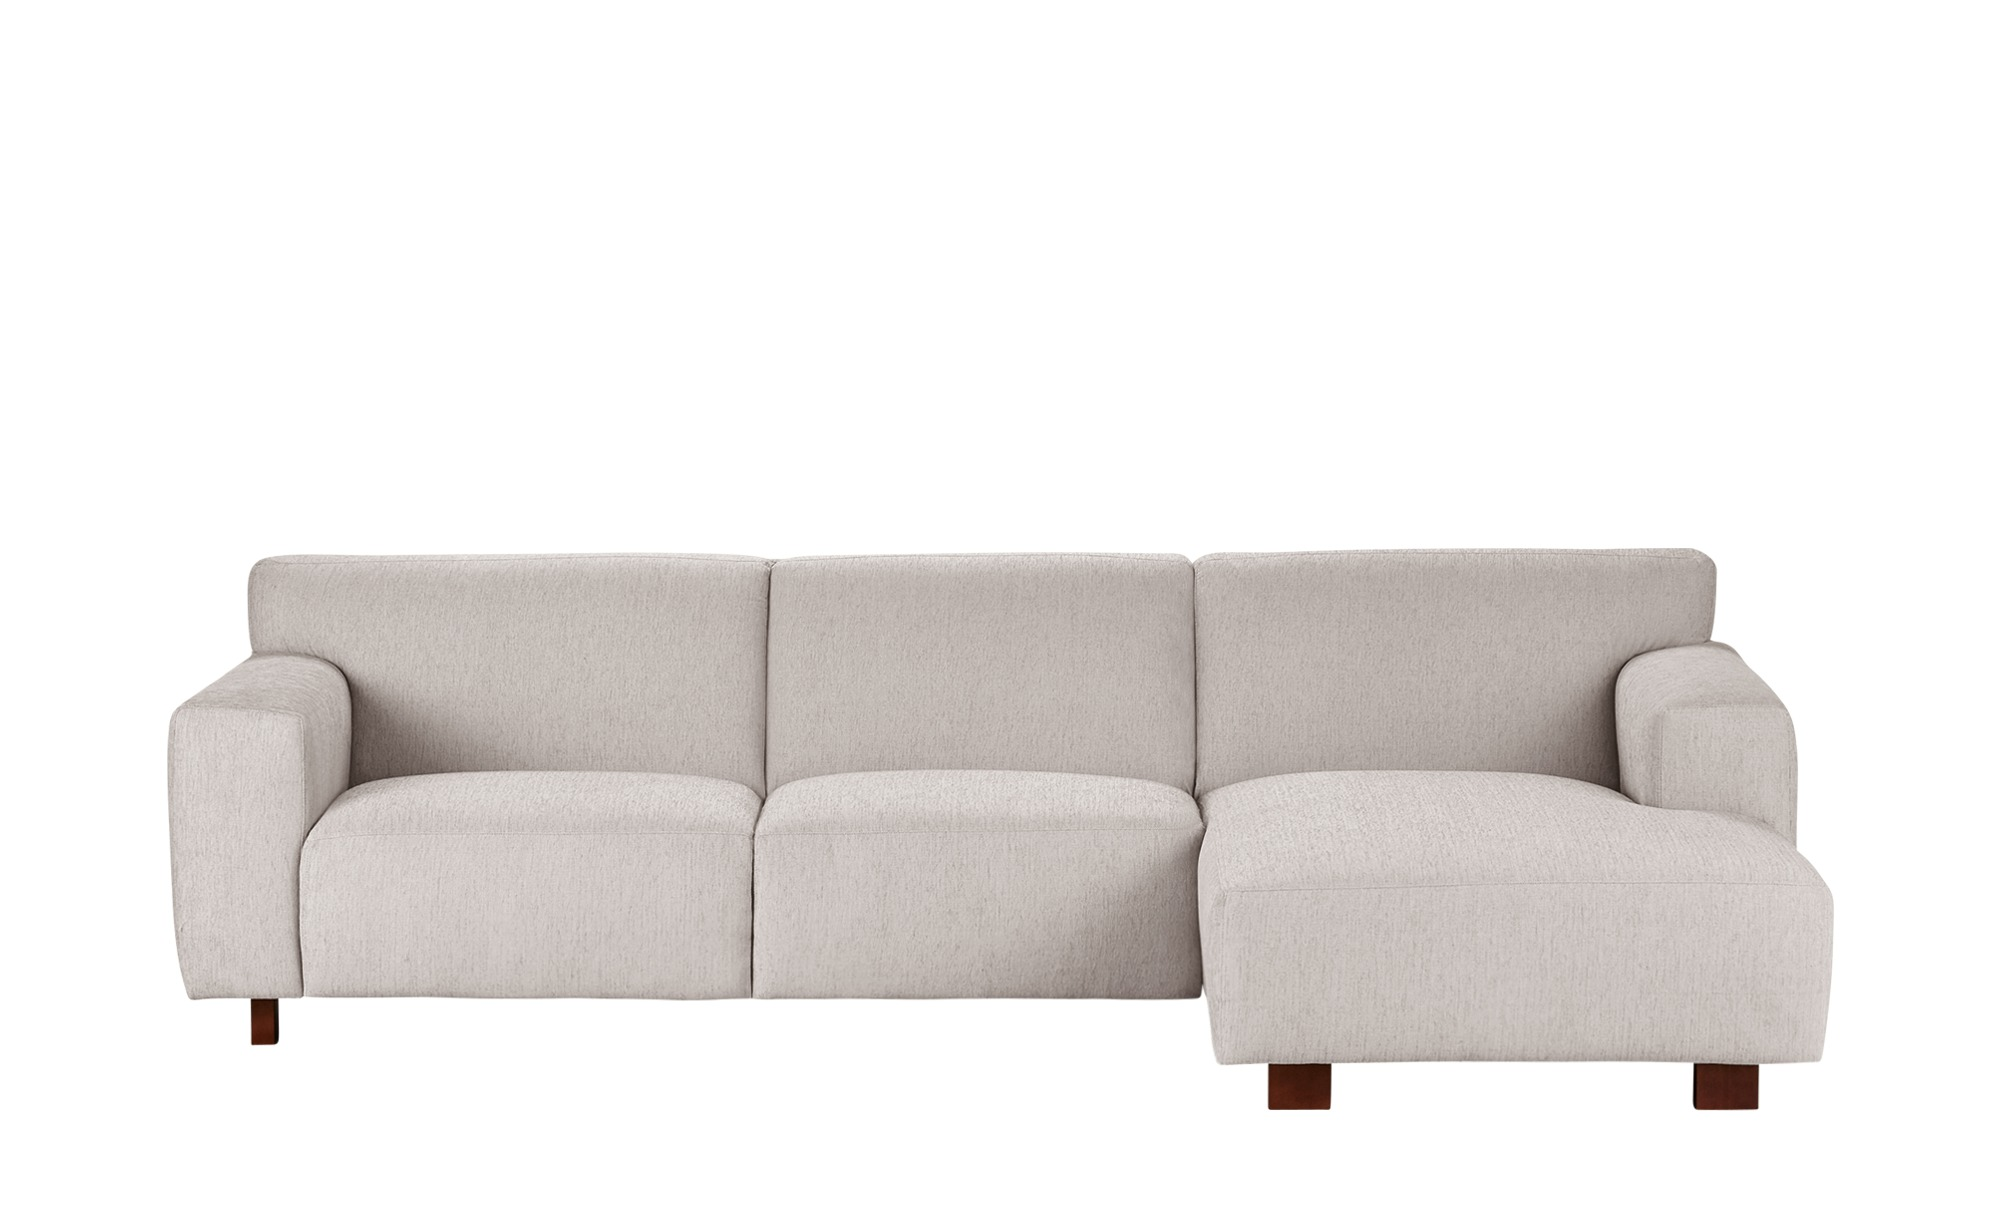 soho ecksofas eckcouches online kaufen m bel. Black Bedroom Furniture Sets. Home Design Ideas